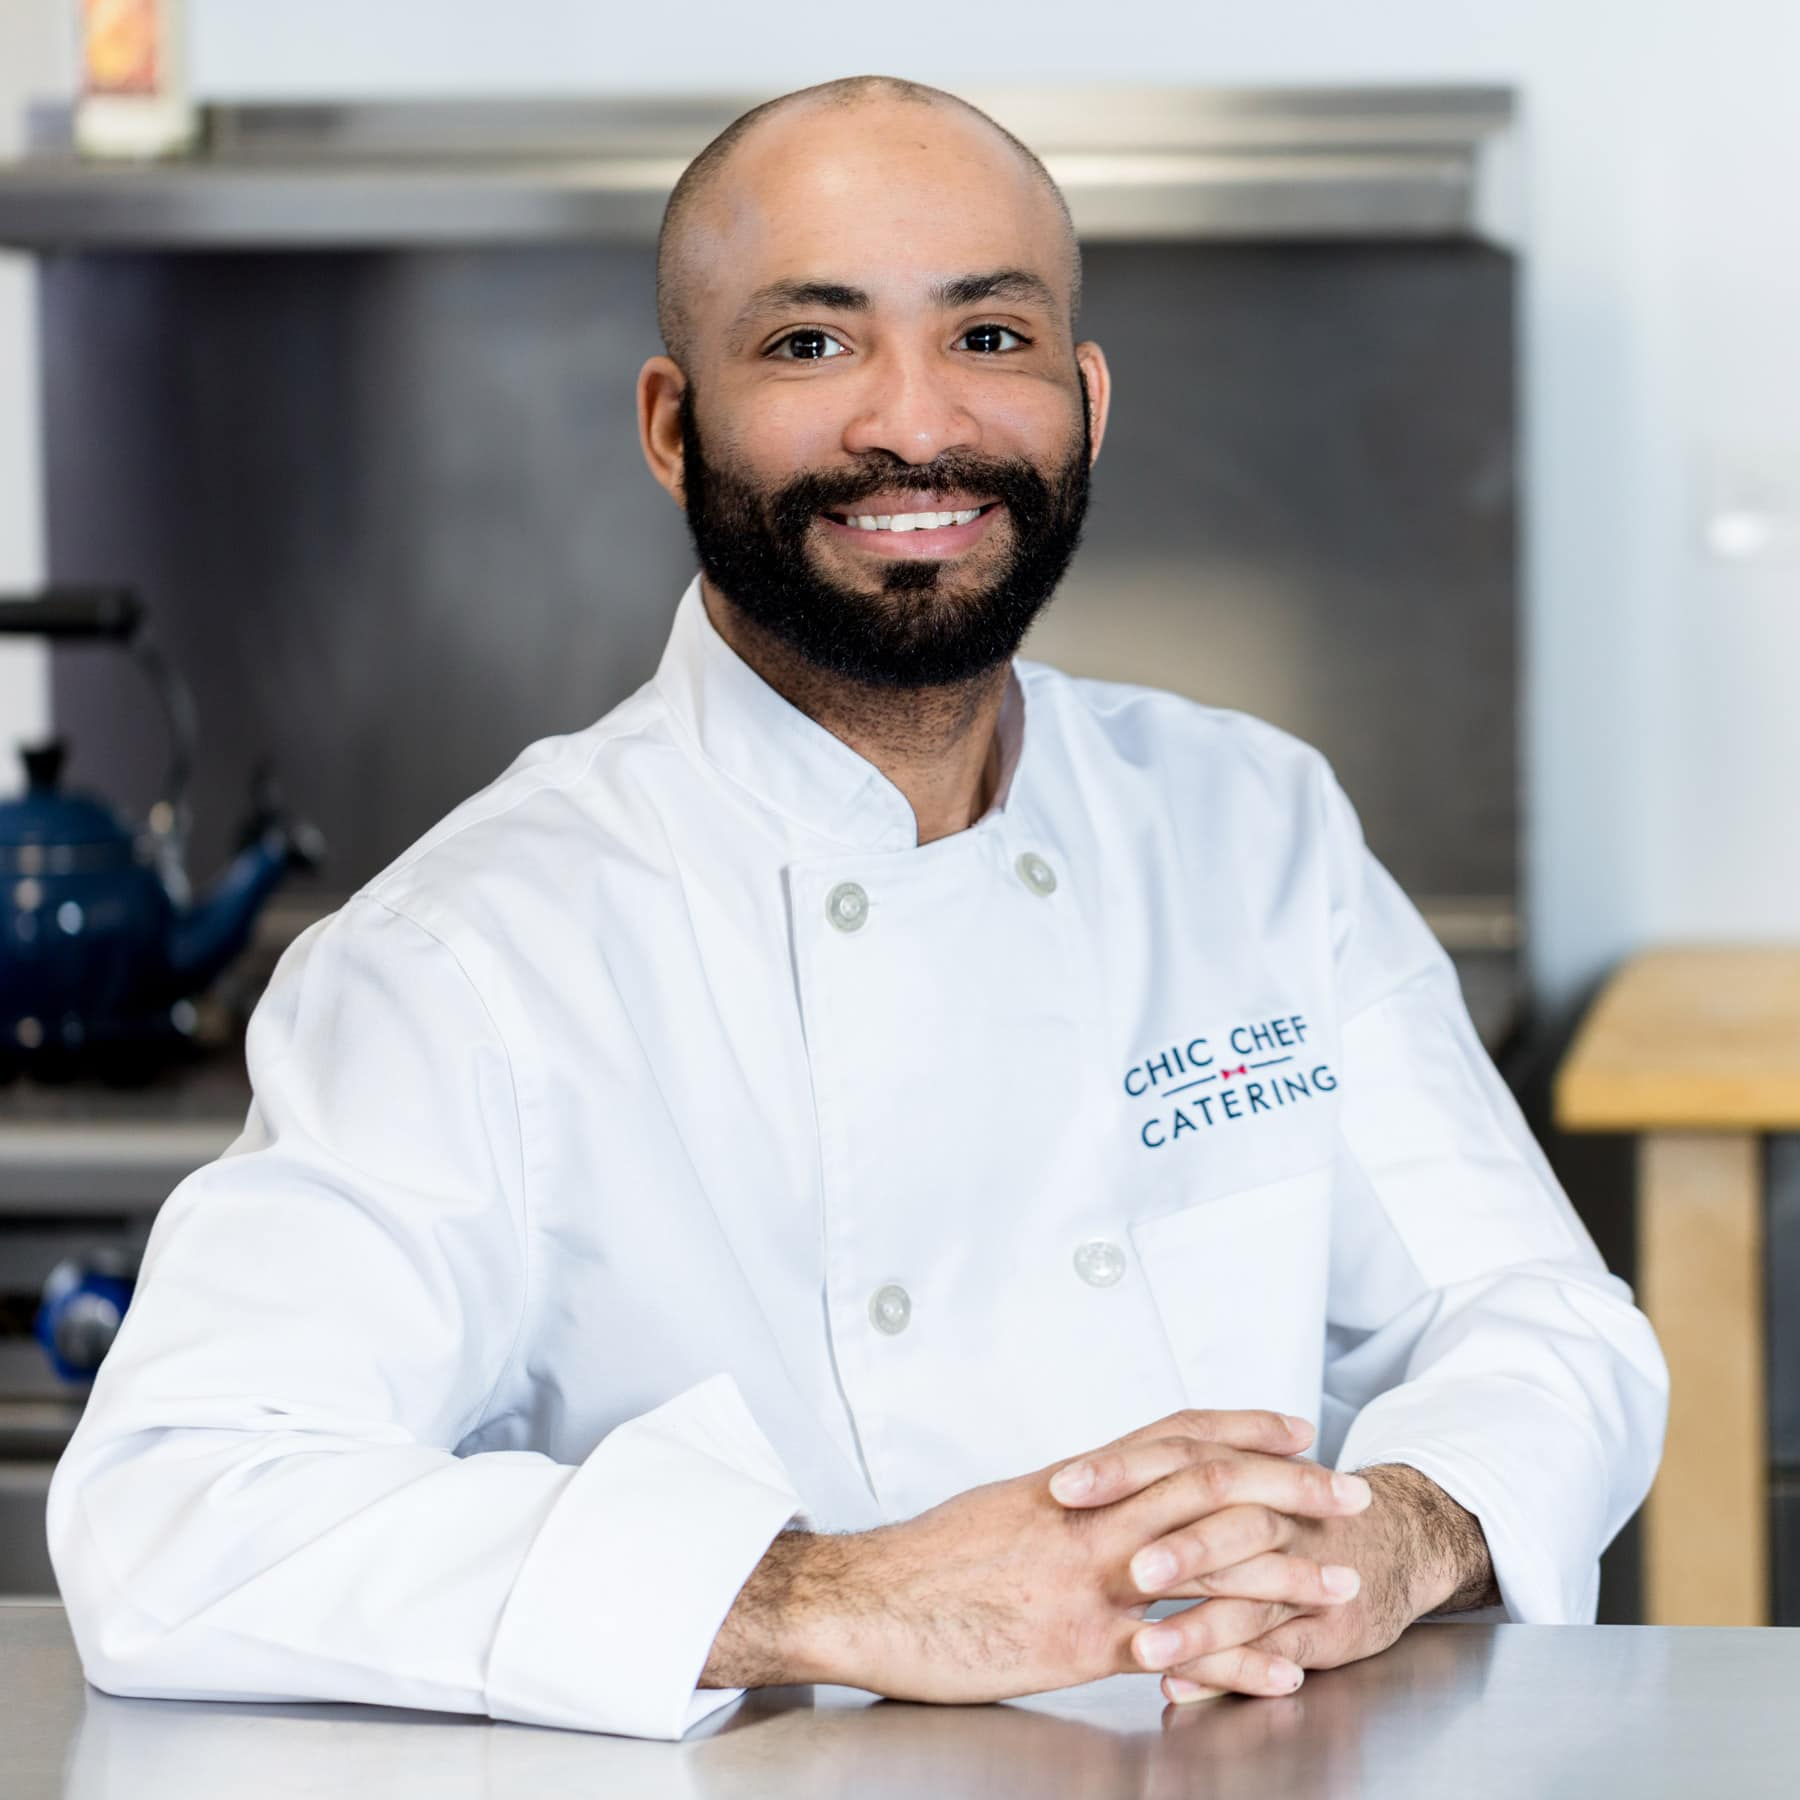 Tedrick Fisher, Lead Chef